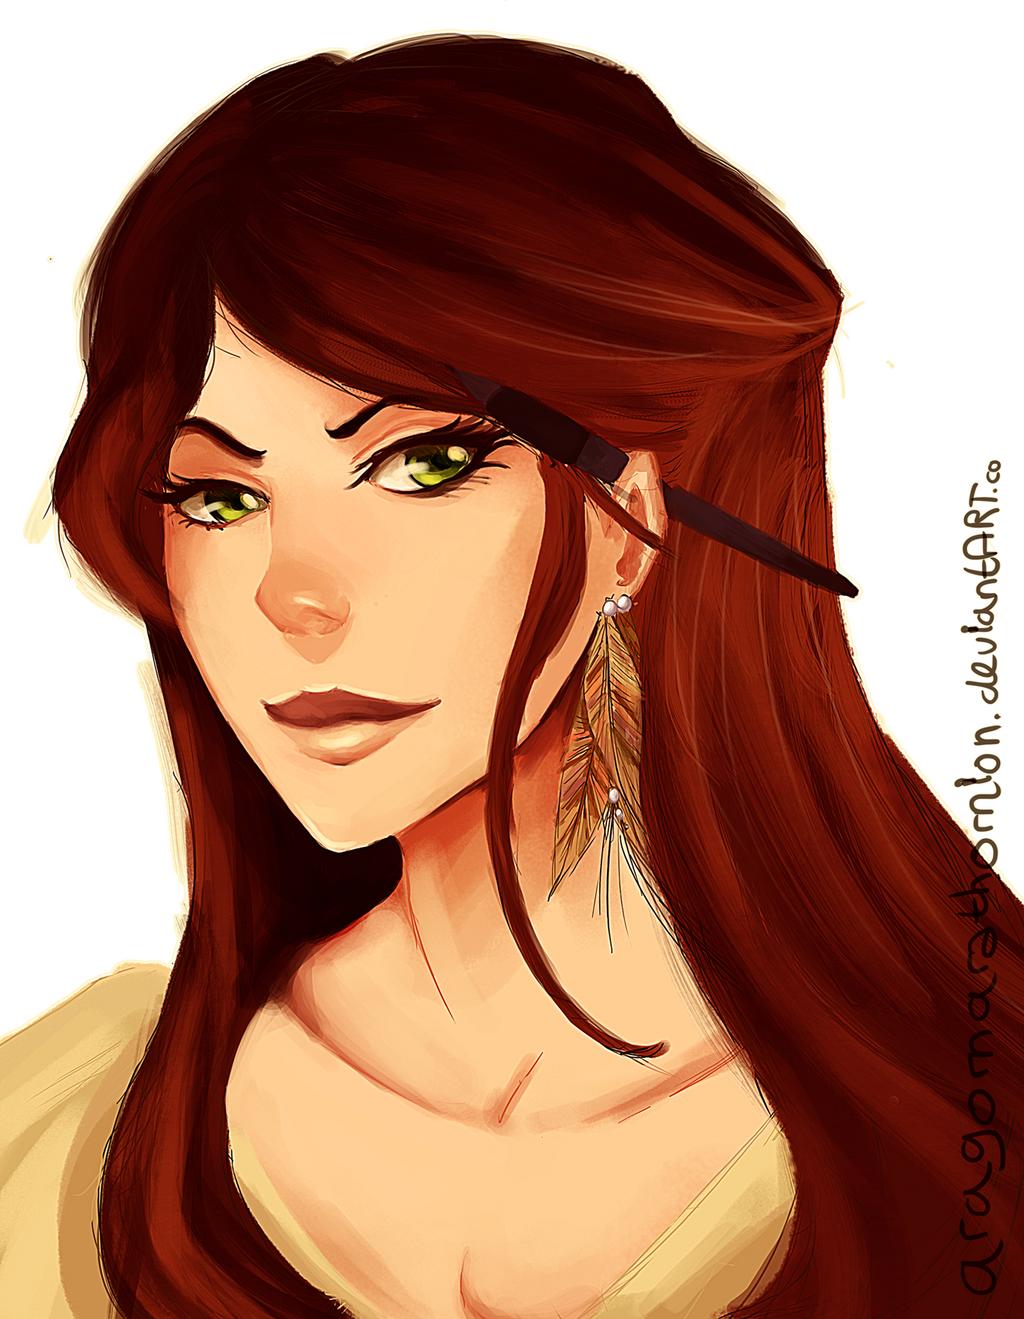 AragornArathornion's Profile Picture